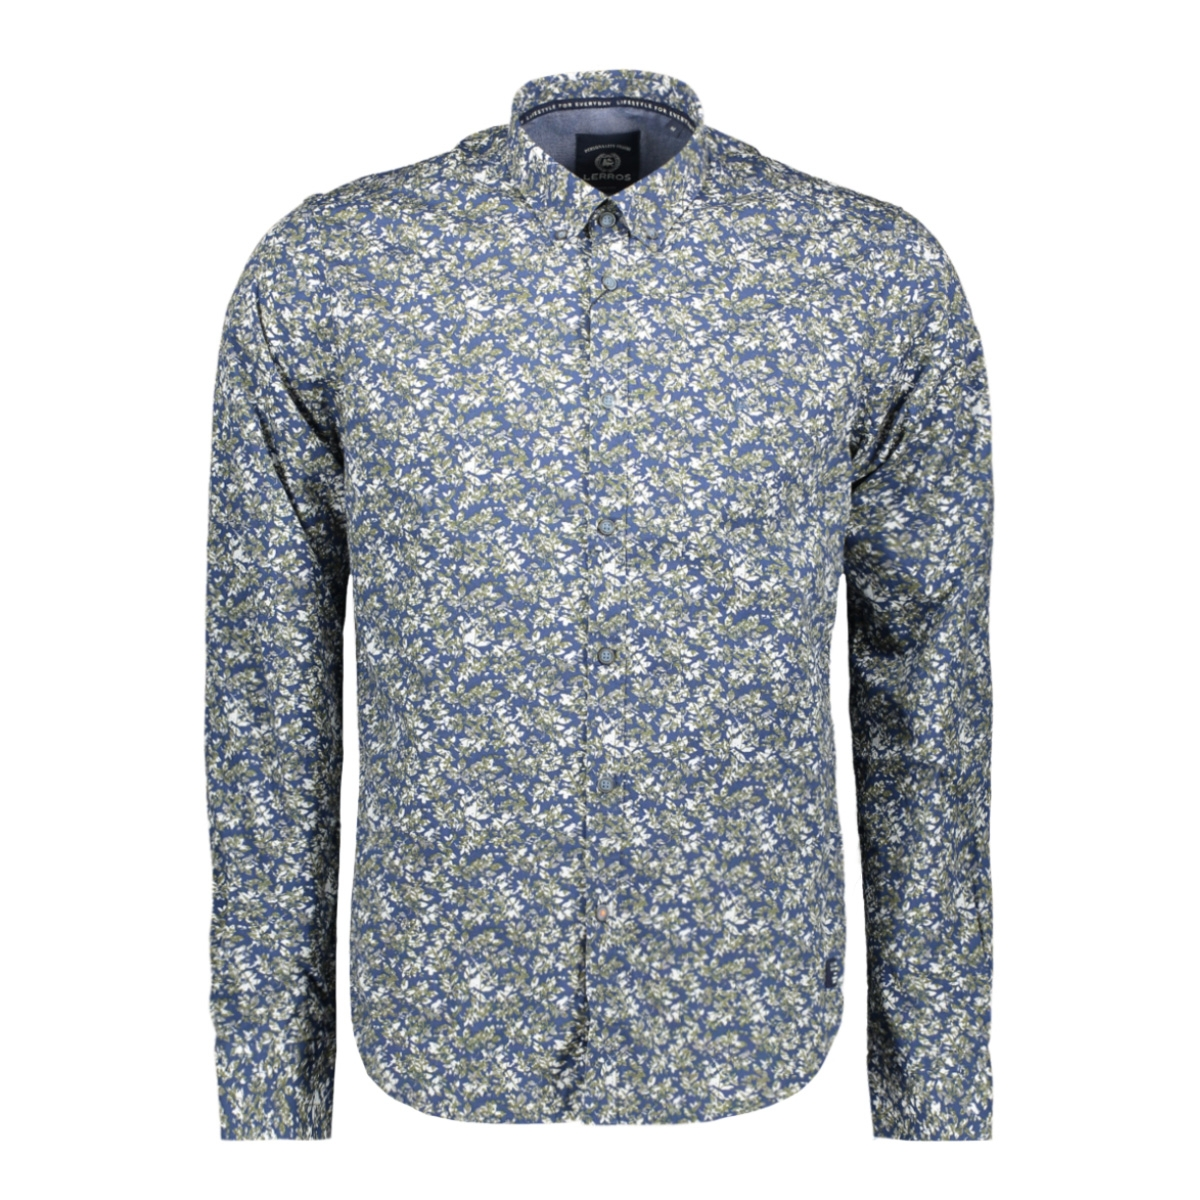 overhemd met all over print 2971119 lerros overhemd 643